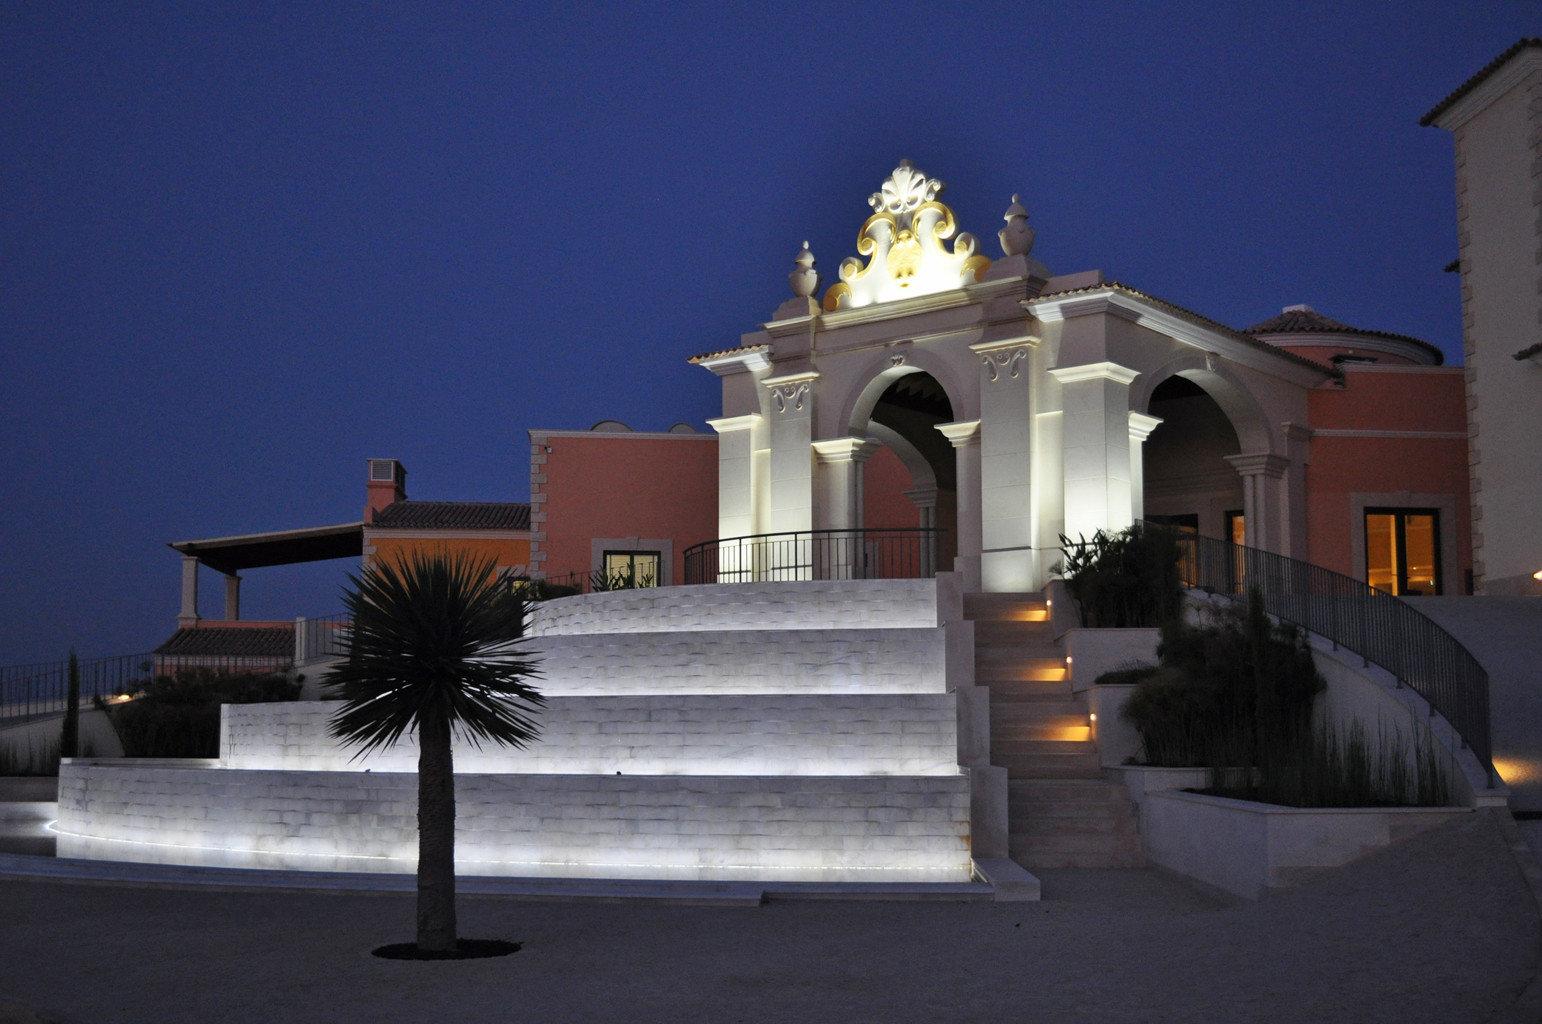 Beachfront Buildings Grounds Resort sky landmark house building night Architecture lighting place of worship chapel